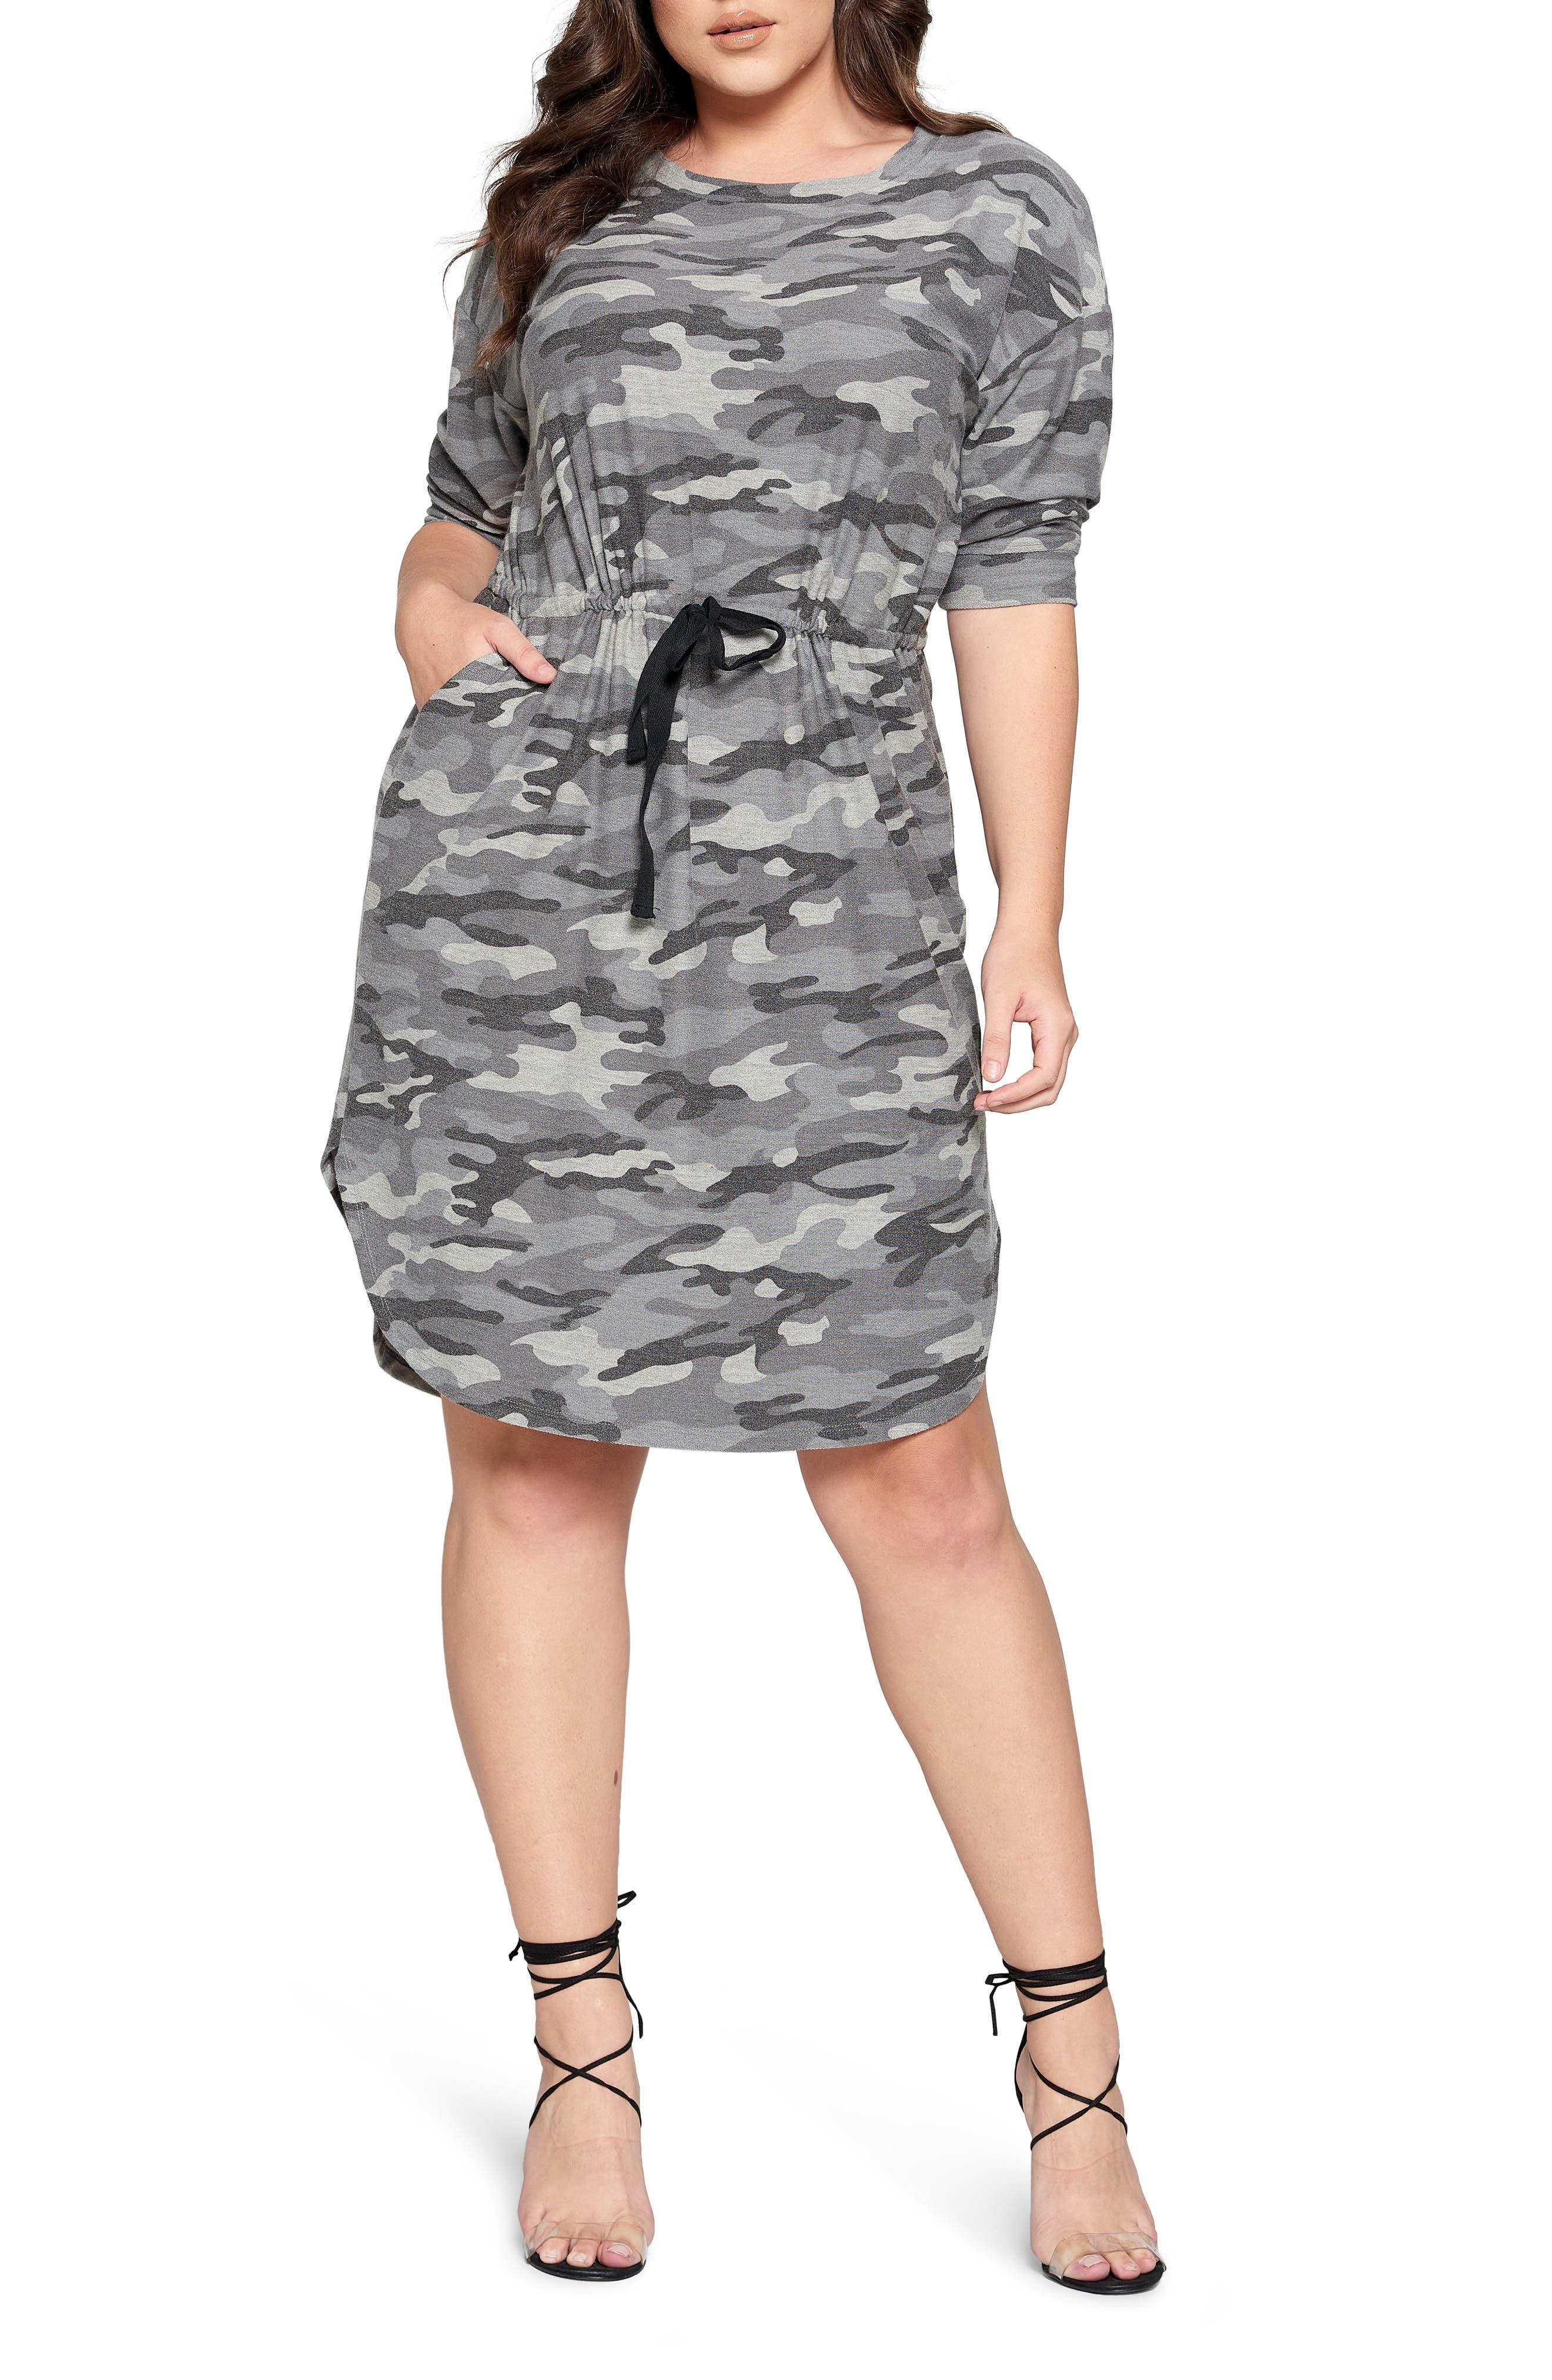 Camo Print Drawstring Waist Drop Shoulder Cotton Knit Dress